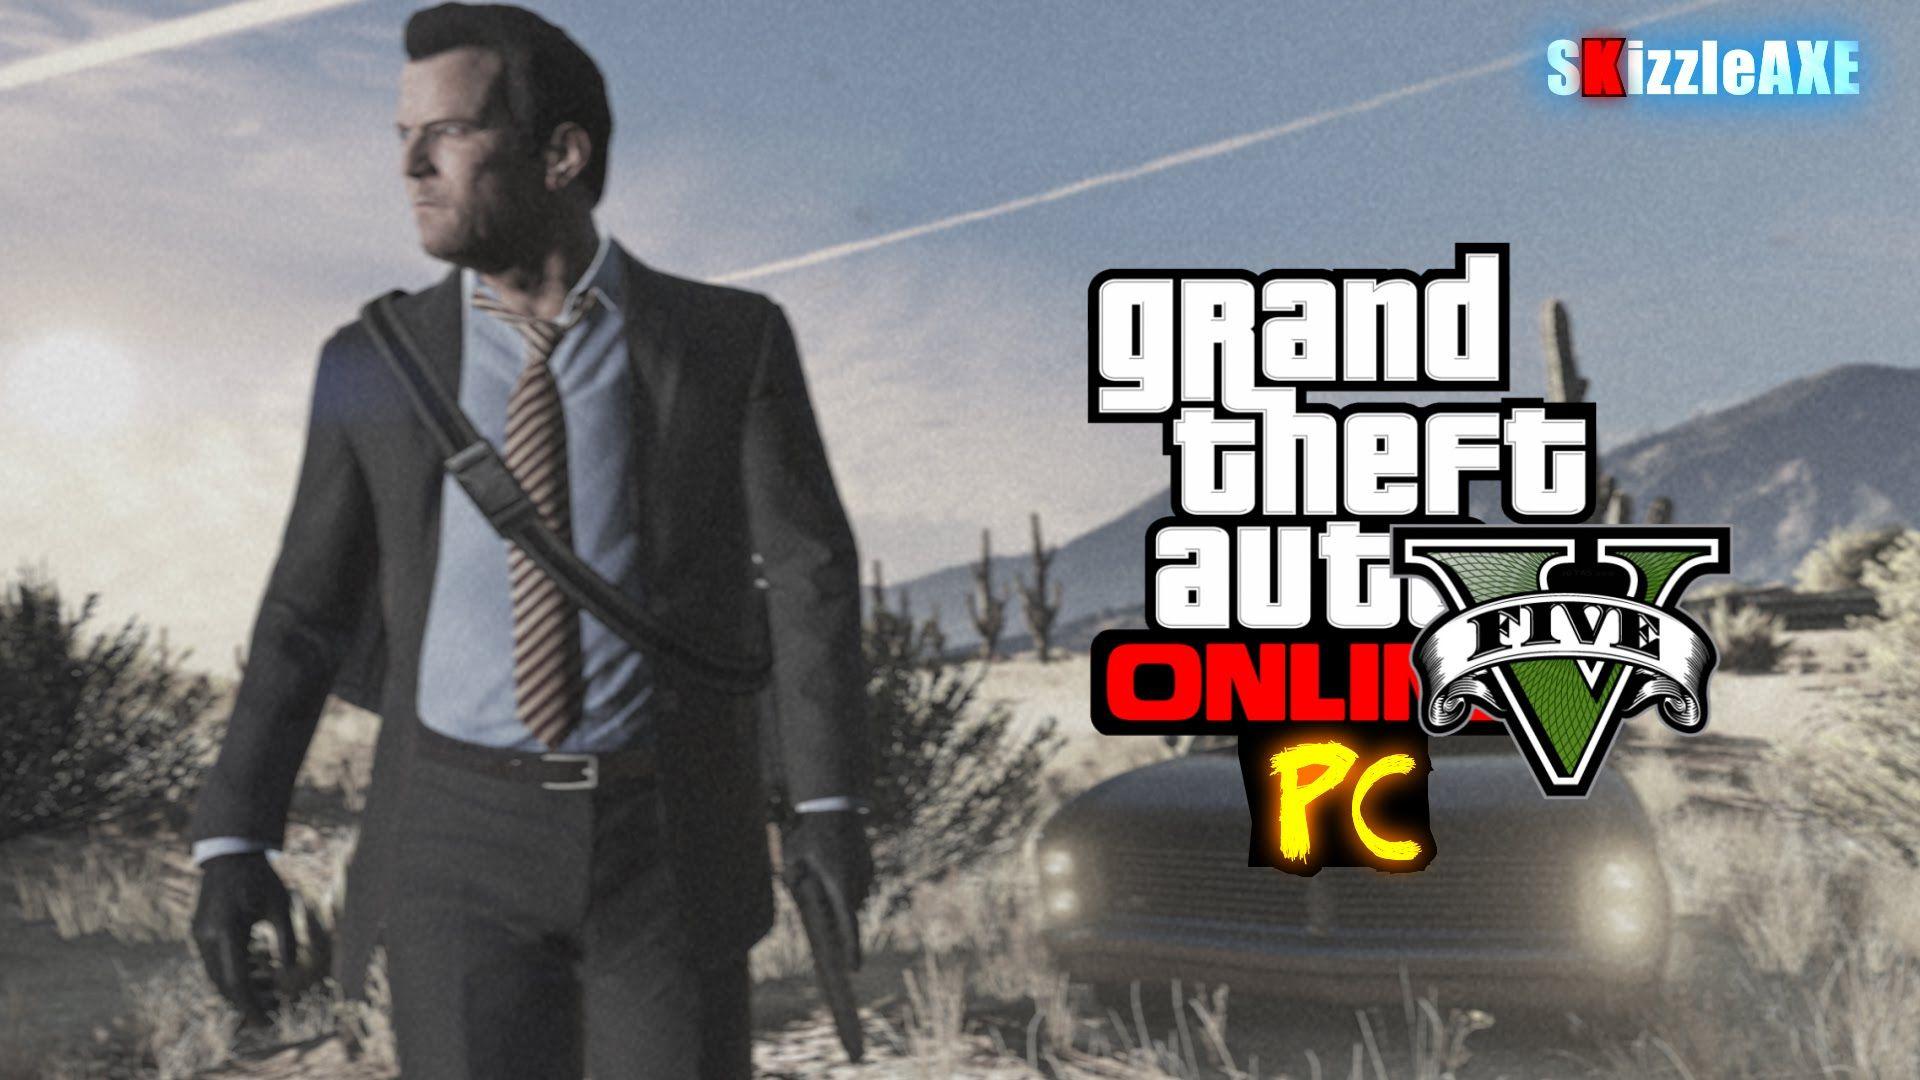 Gta 5 Gta Online Pc Gameplay Grand Theft Auto 5 Online Pc 1080p 60 Fps Gameplay Gta